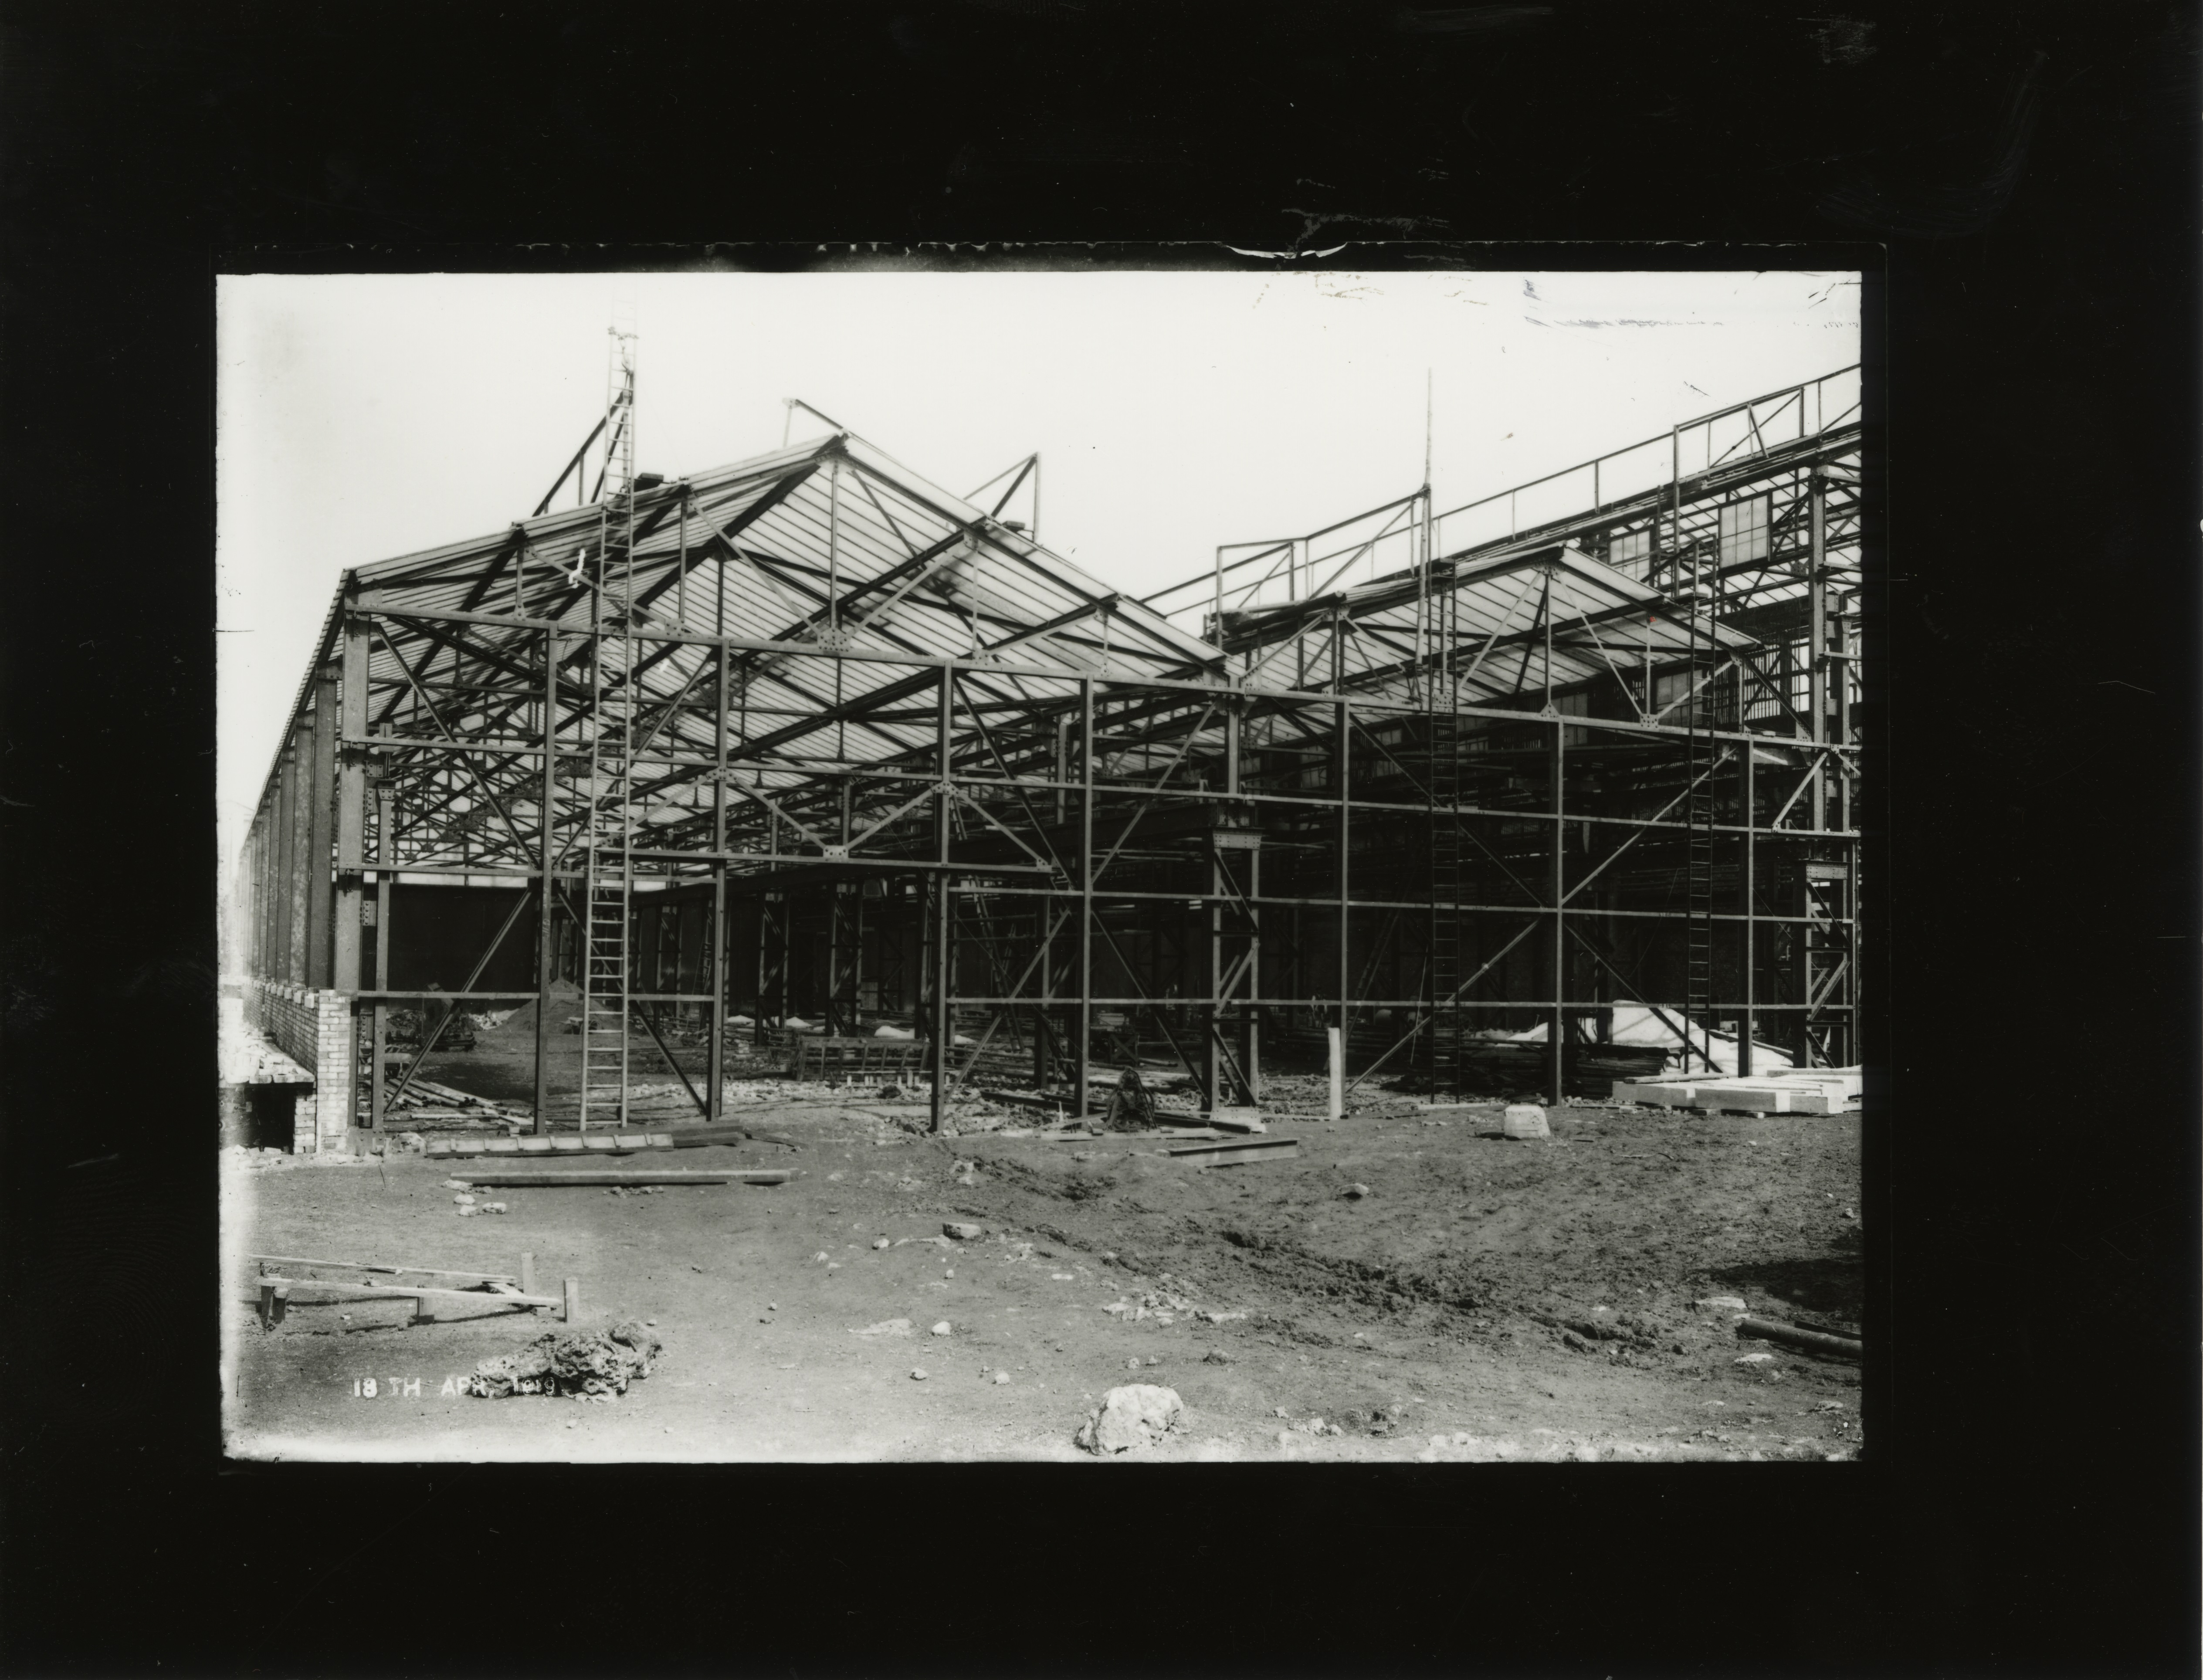 18 April 1919